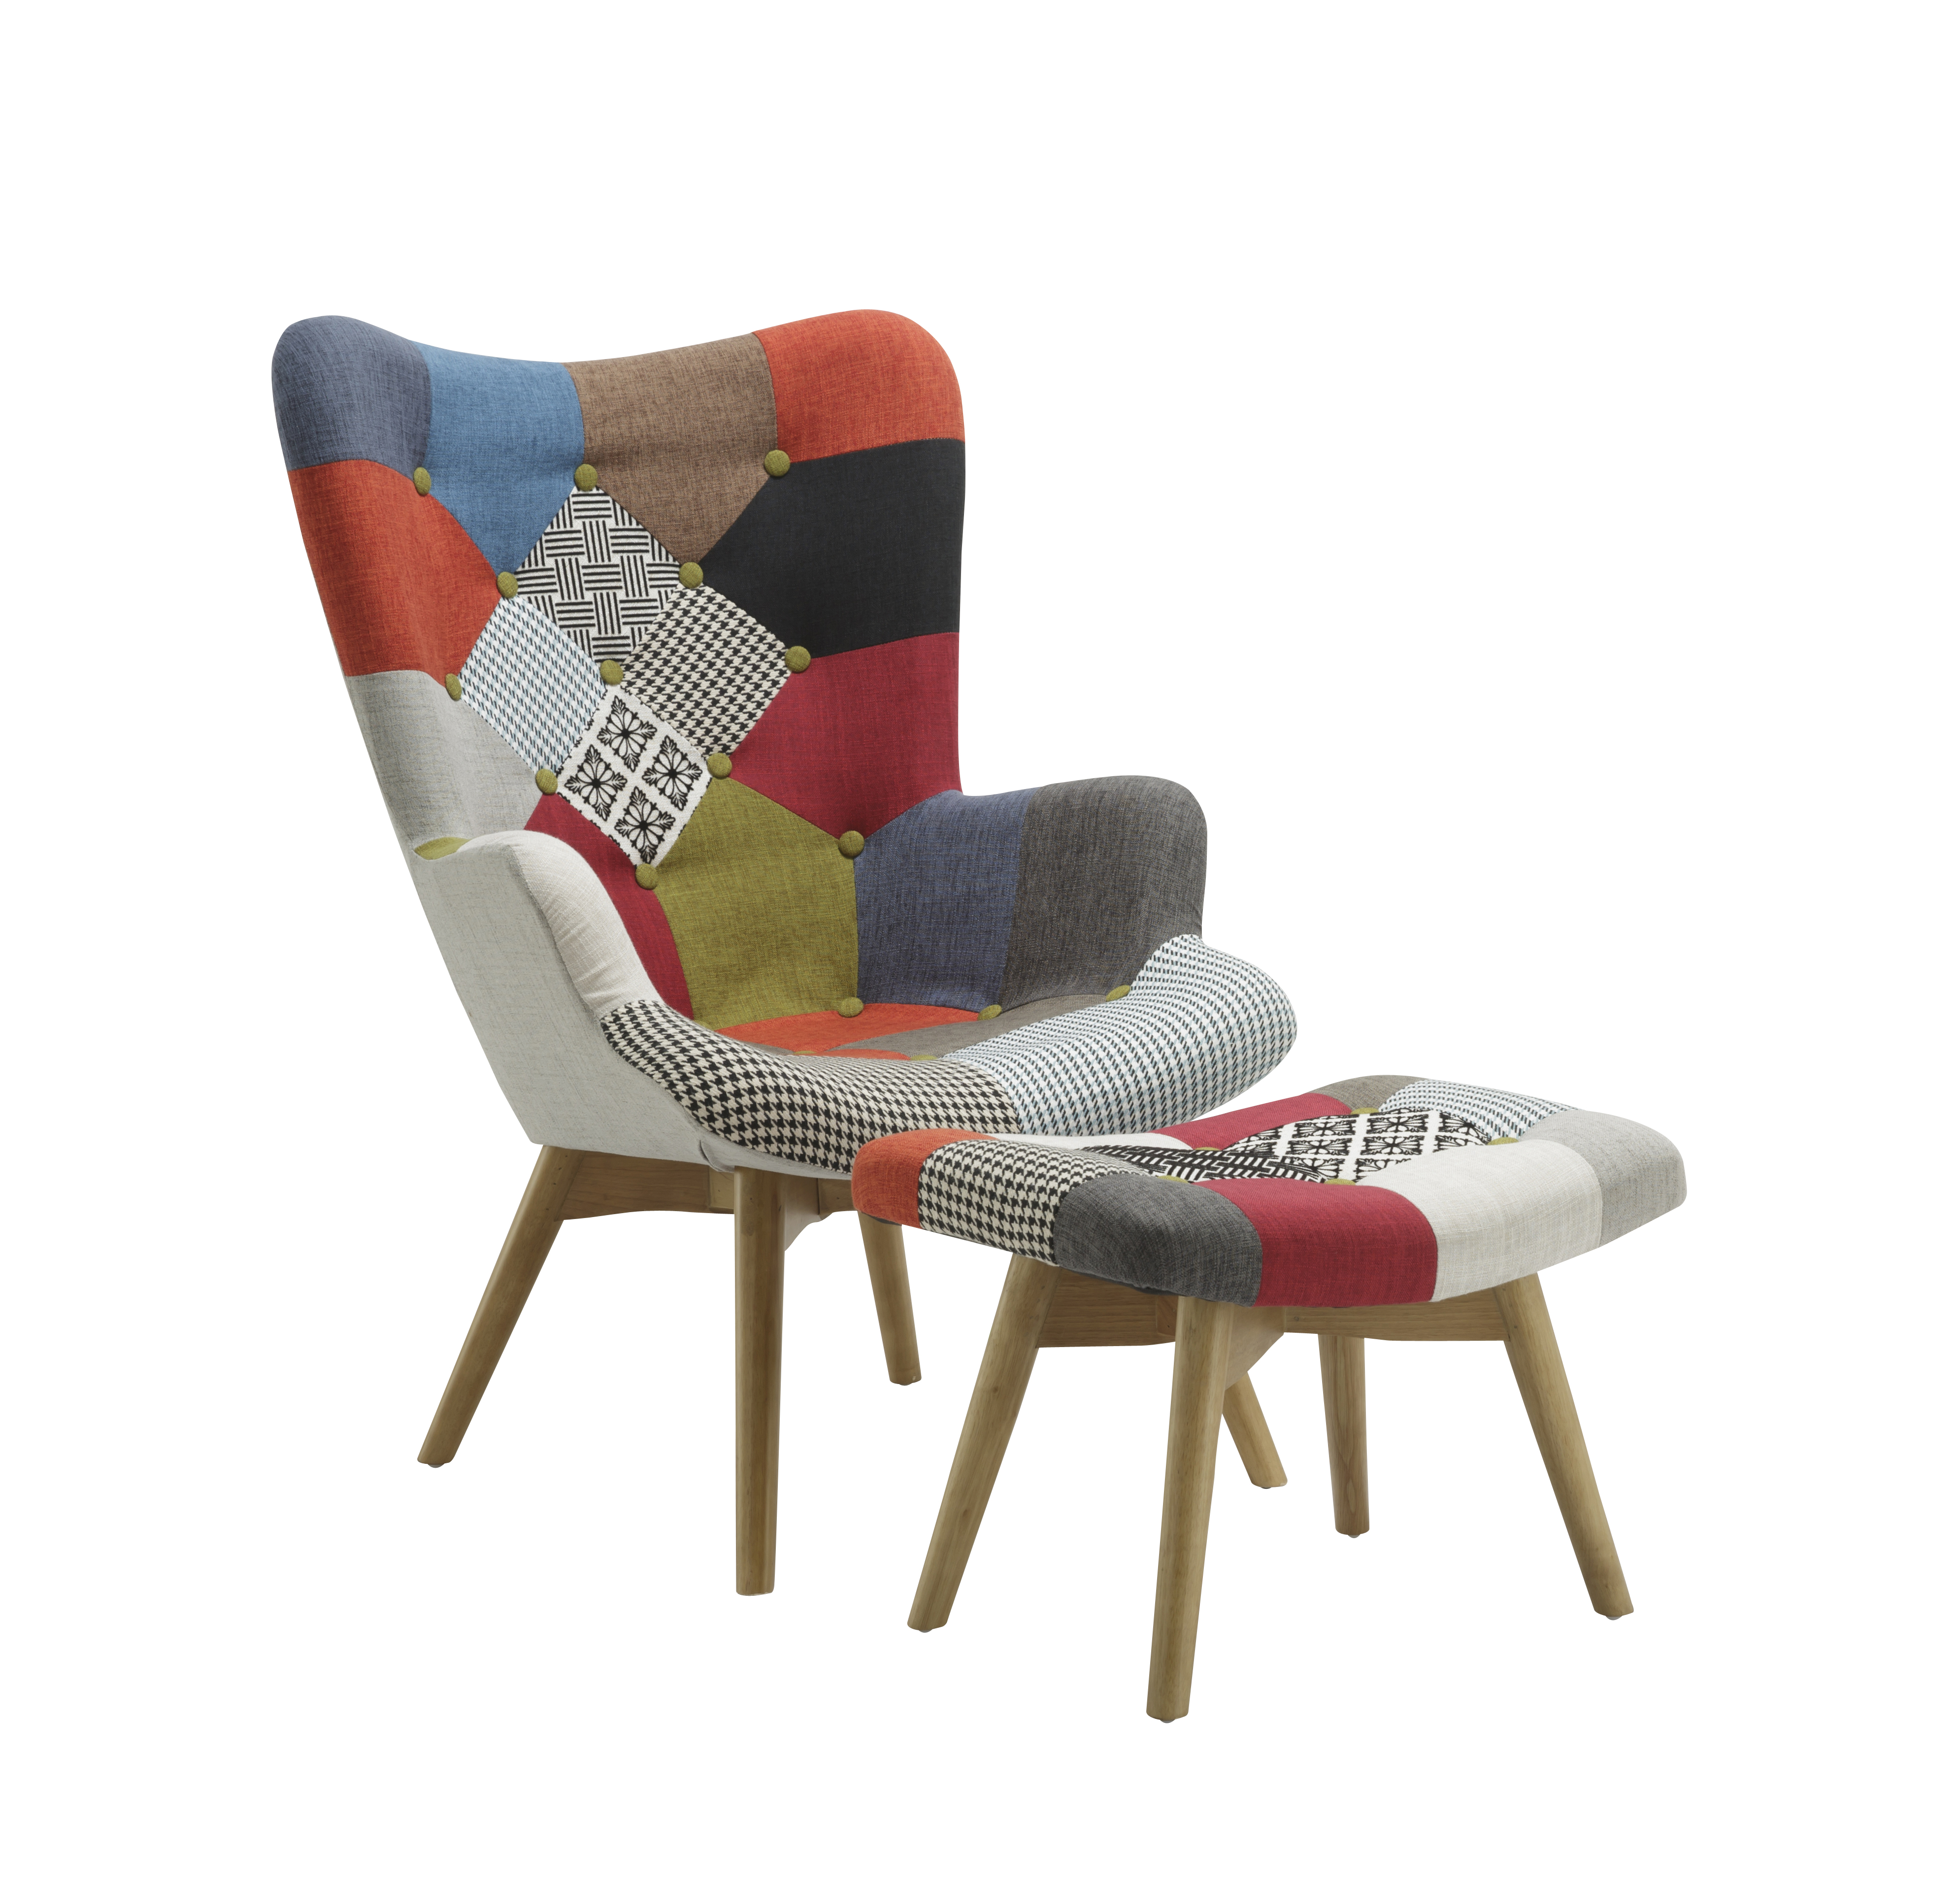 Patchwork Armchair & Stool Multicolour